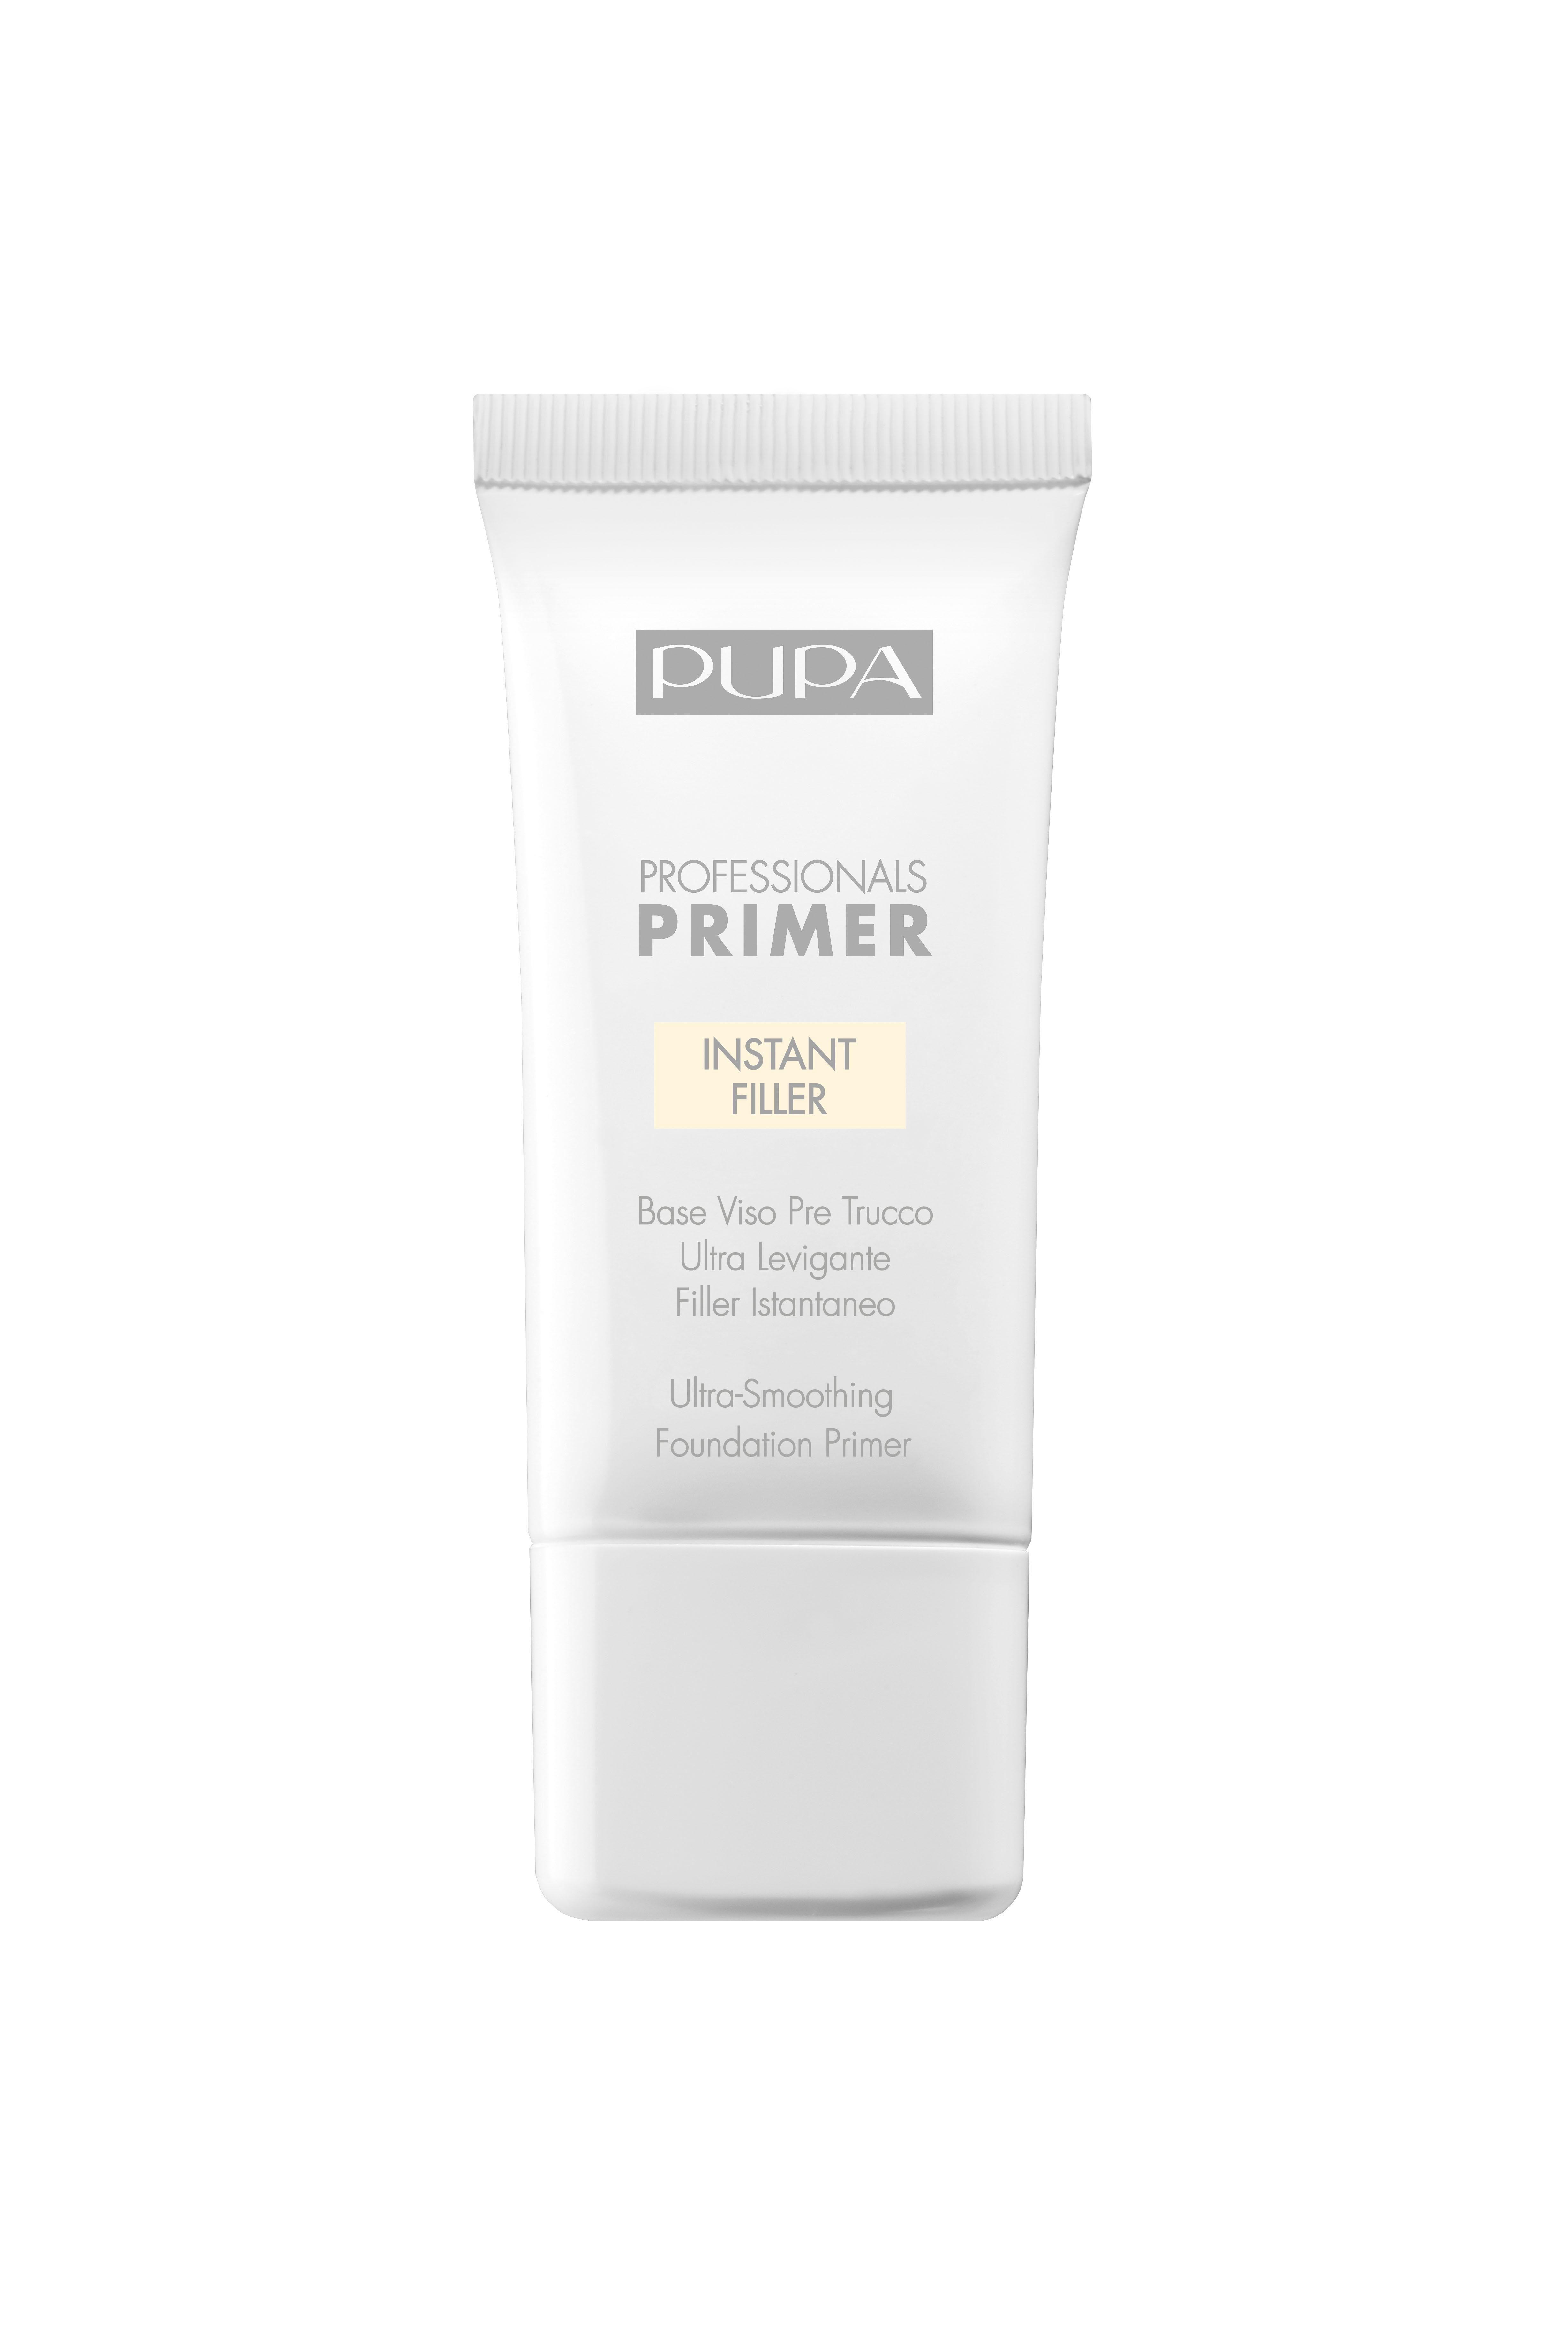 PUPA Основа под макияж, для зрелой кожи 006 / PROFESSIONALS PRIMER ULTRA 30мл